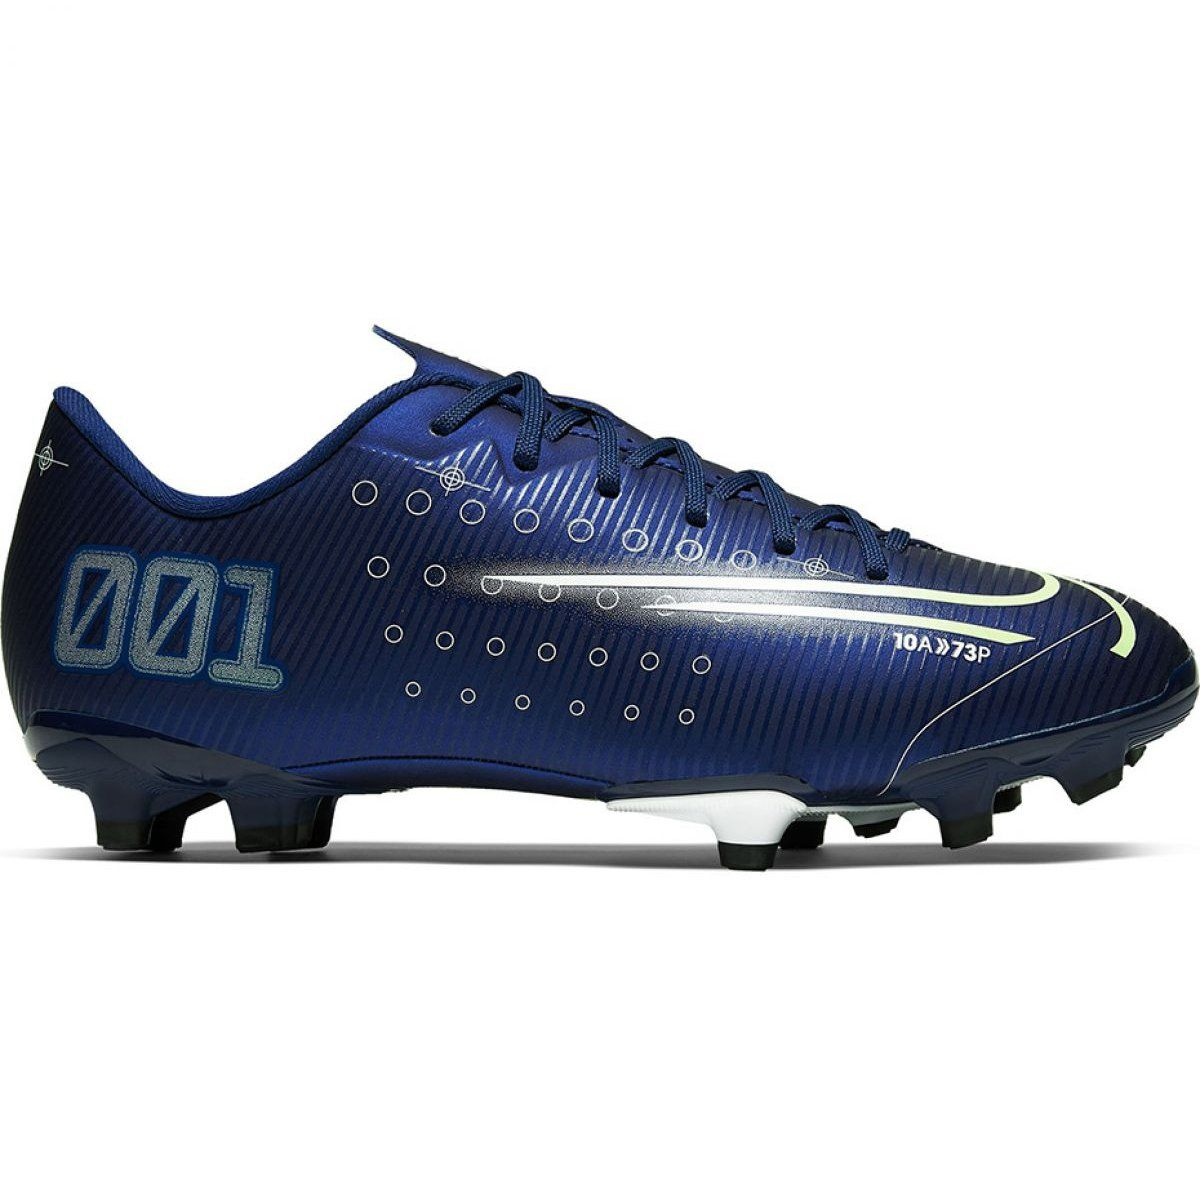 Buty Pilkarskie Nike Mercurial Vapor 13 Academy Mds Fg Mg Jr Cj0980 401 Granatowe Granatowe Nike Football Boots Kids Football Boots Football Boots